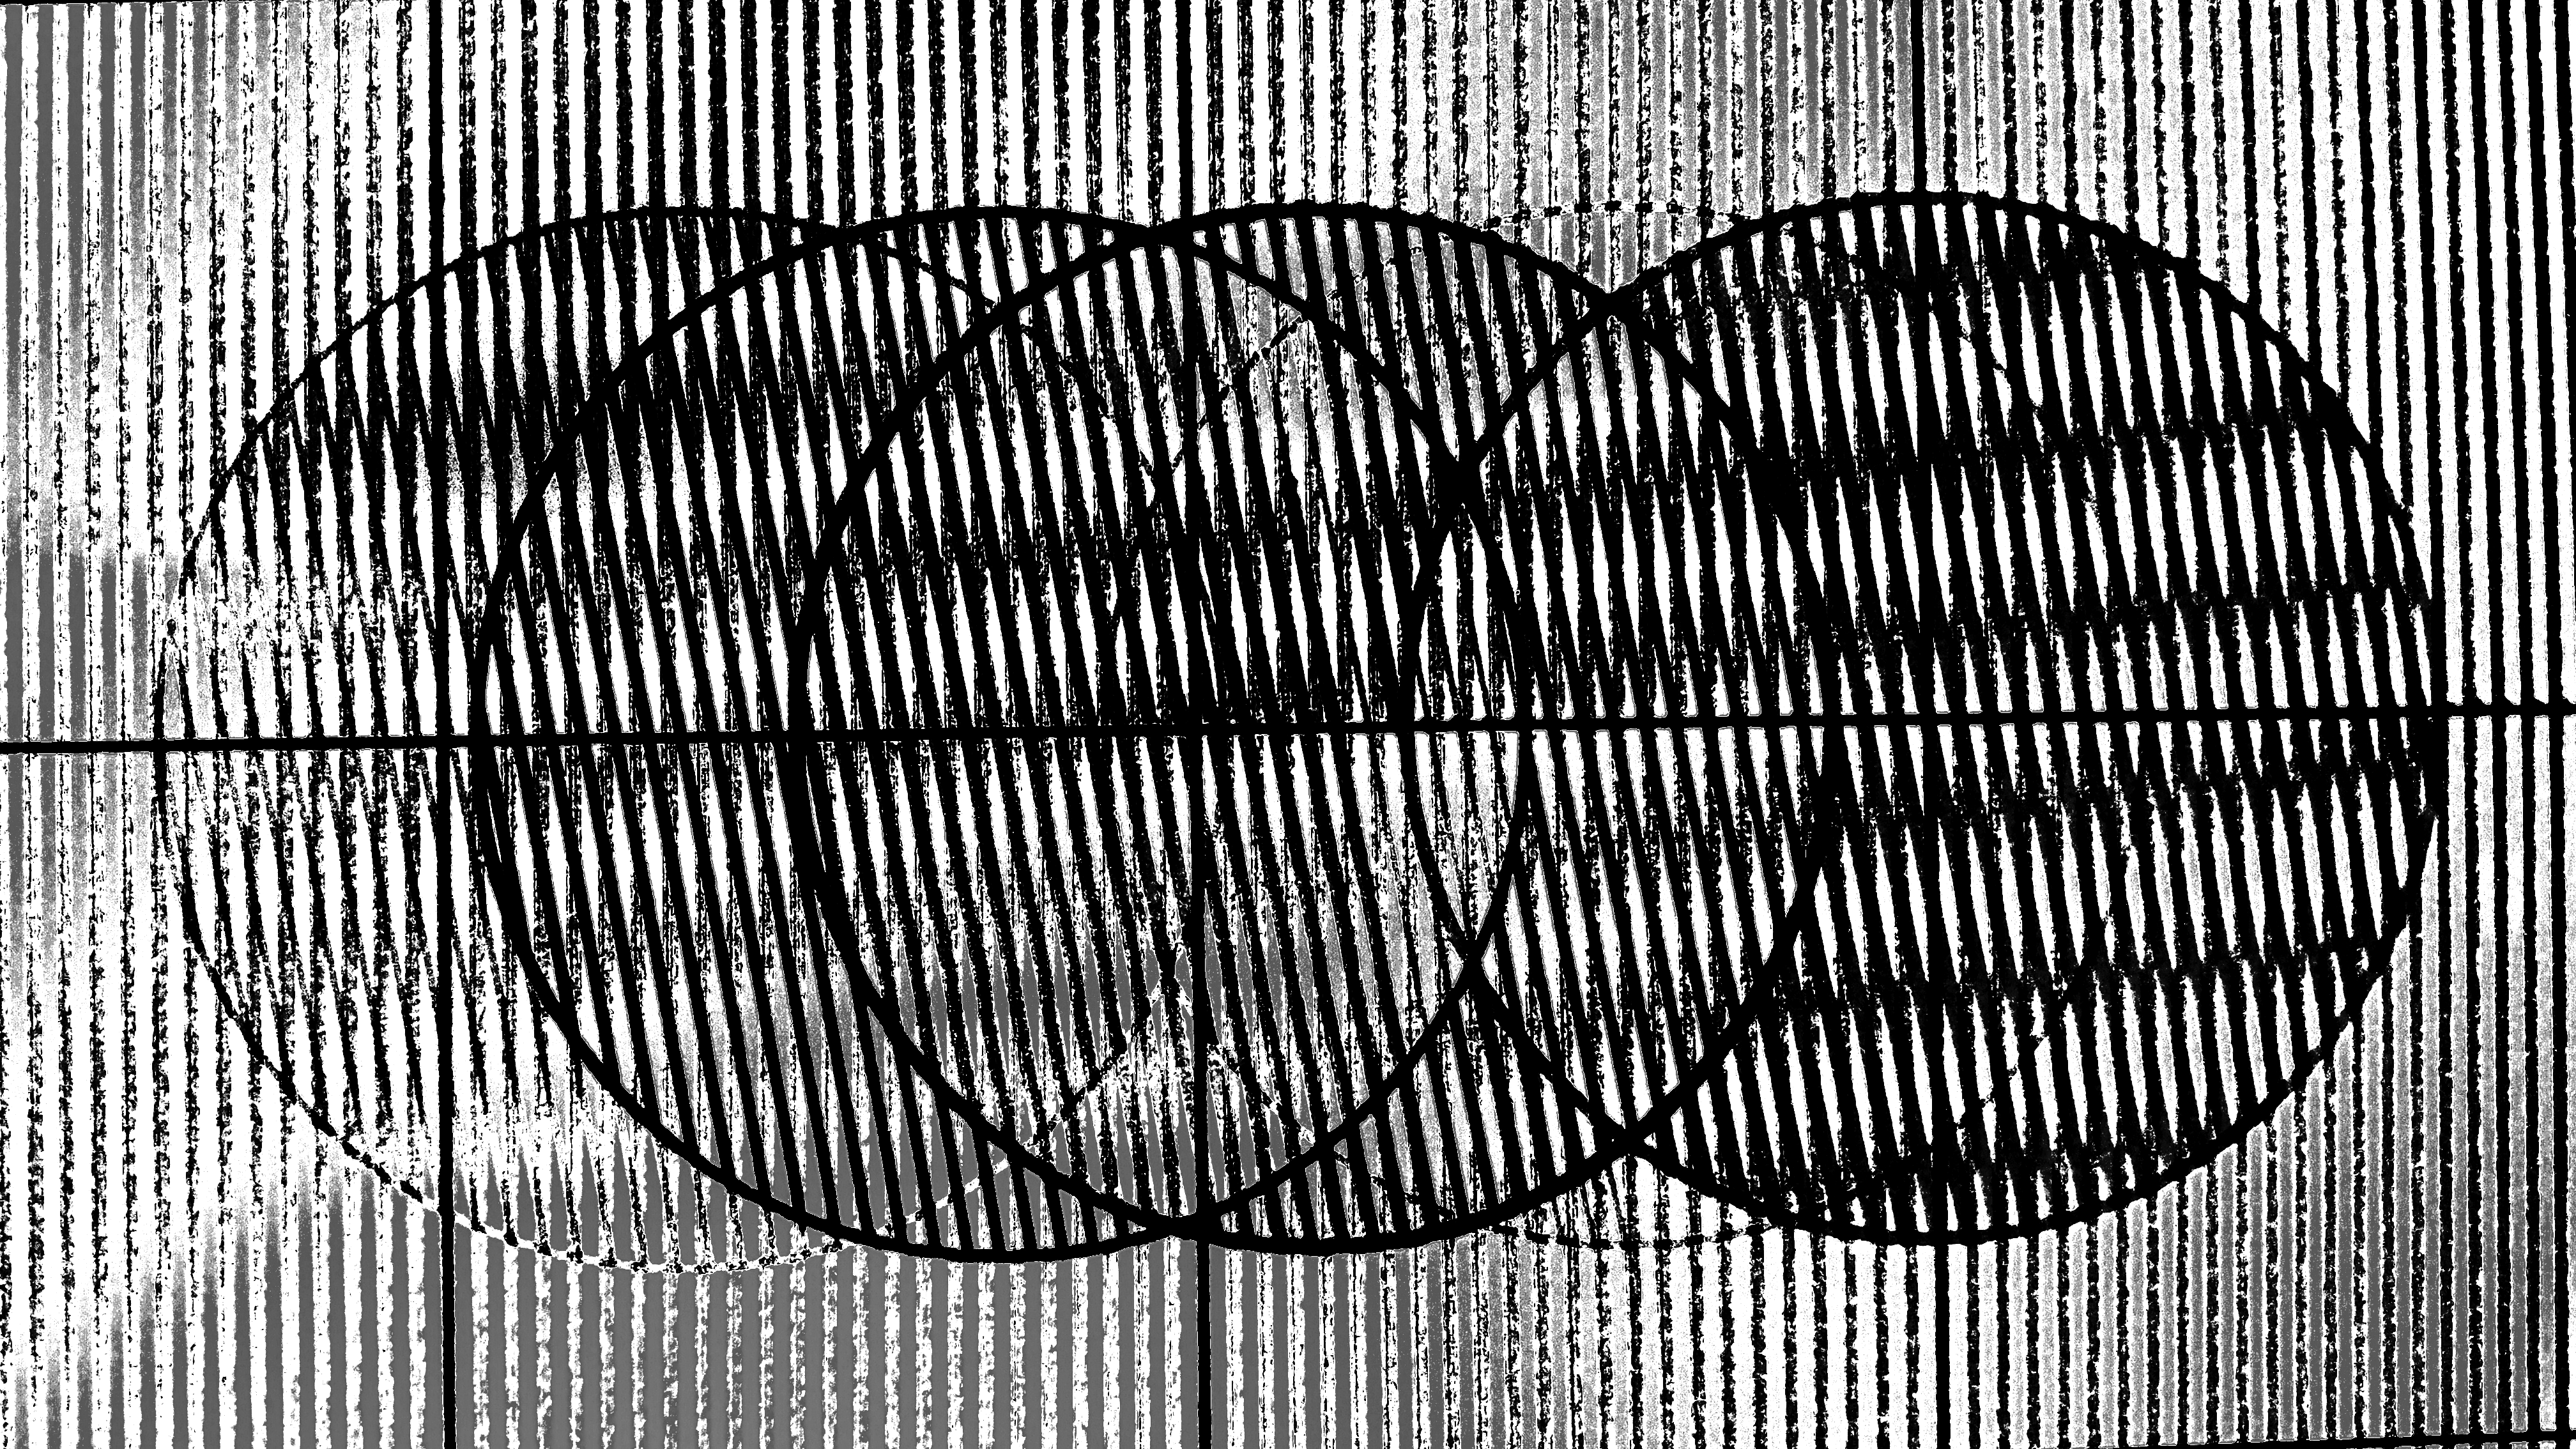 layouts/fond-moirage-noir.png